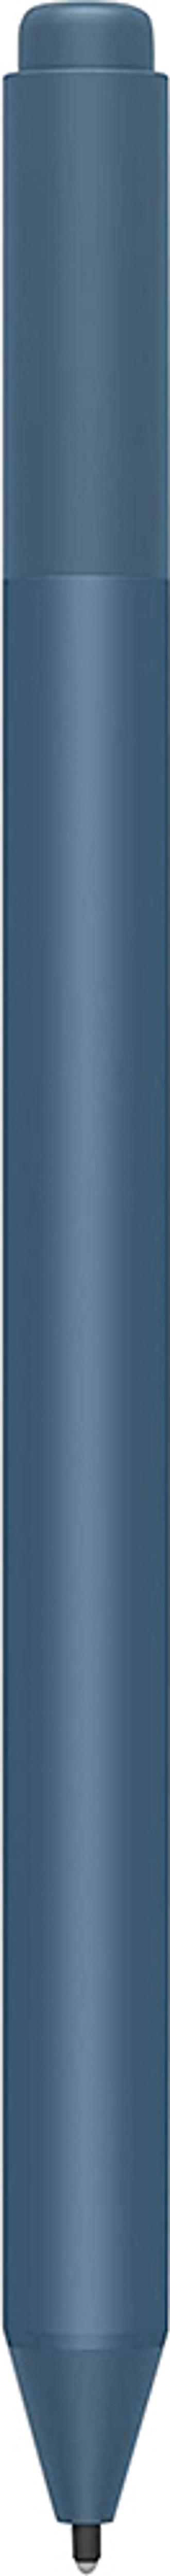 Microsoft Surface Surface Pen M1776 Ice Blue